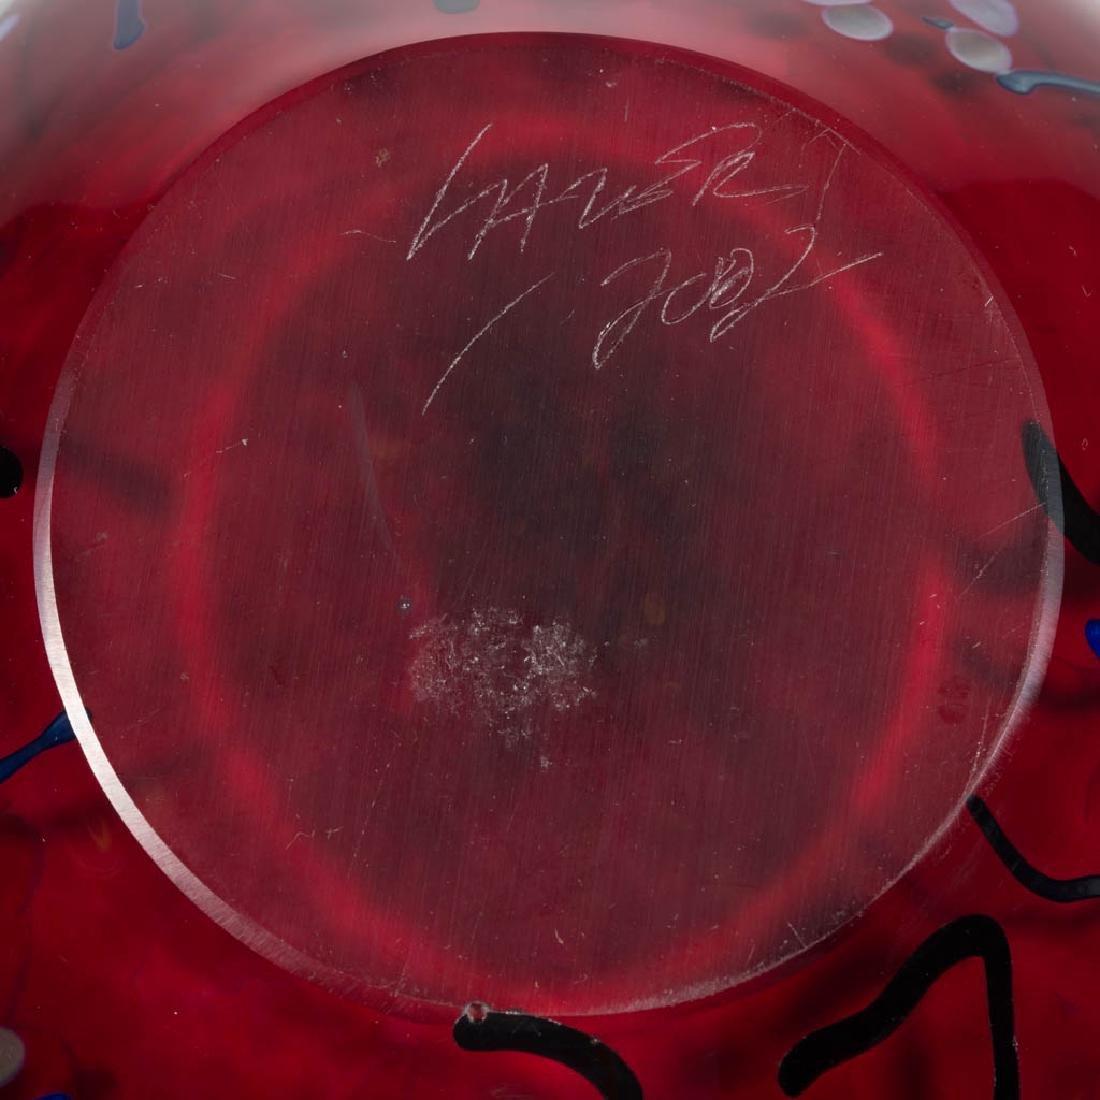 TIM LAZER SPLASH SERIES STUDIO ART GLASS VASE - 4